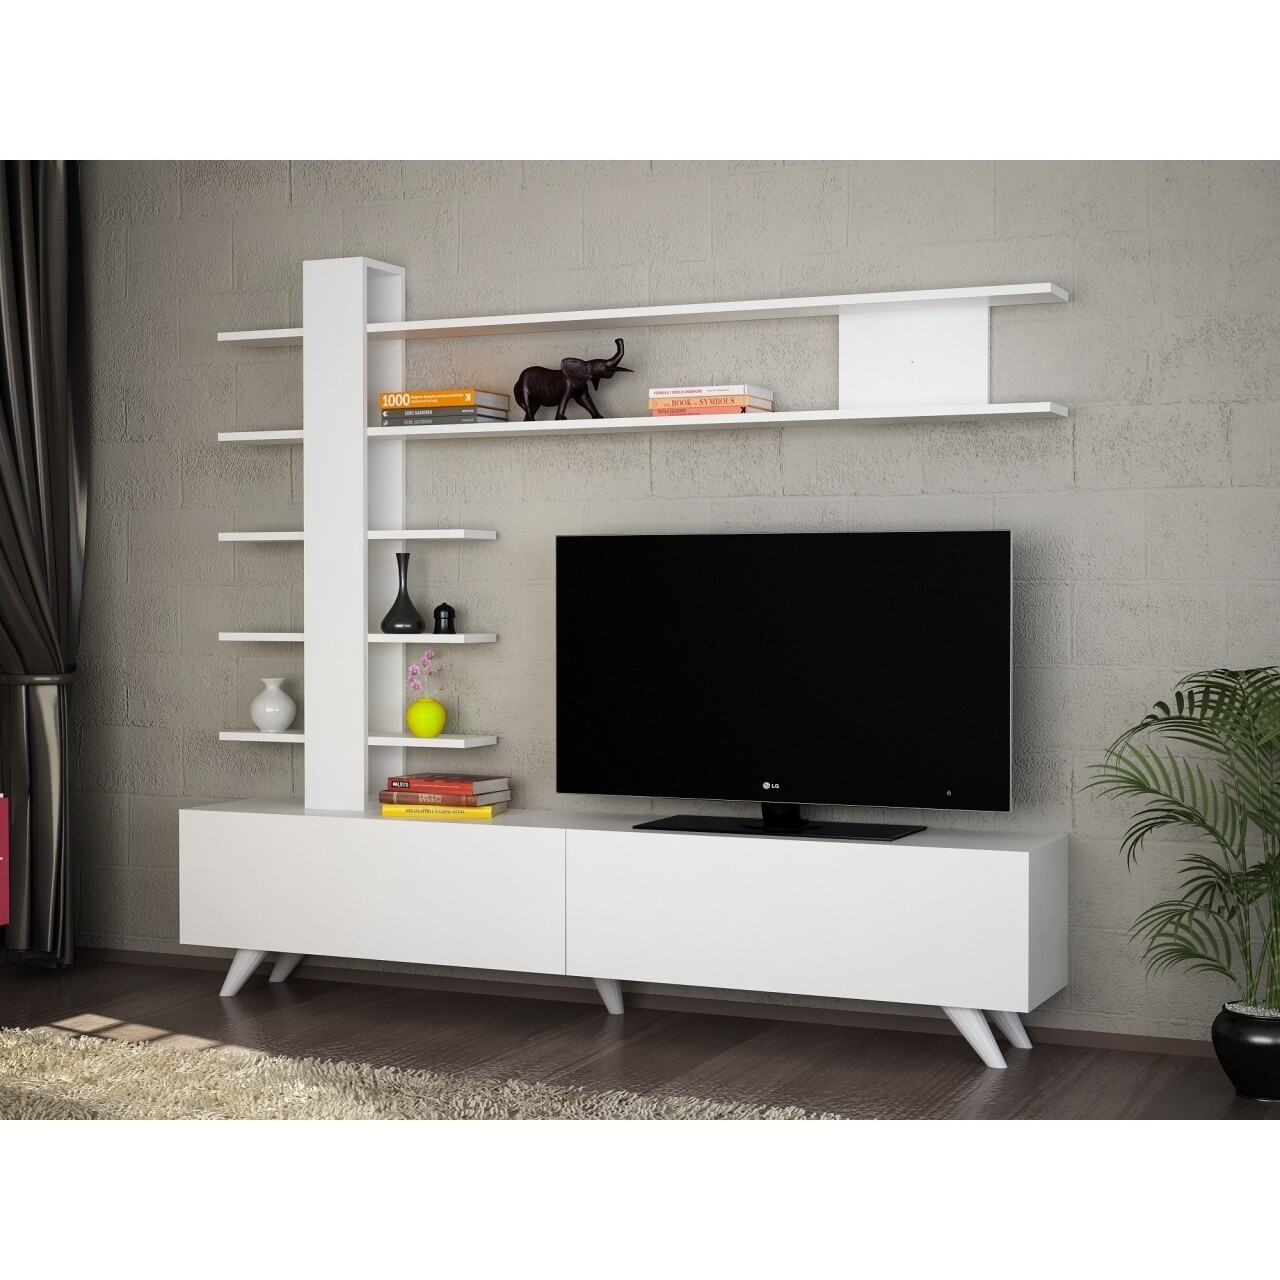 Comoda TV cu raft, Wooden Art, Aleyna White, 180x161.5x31.6 cm